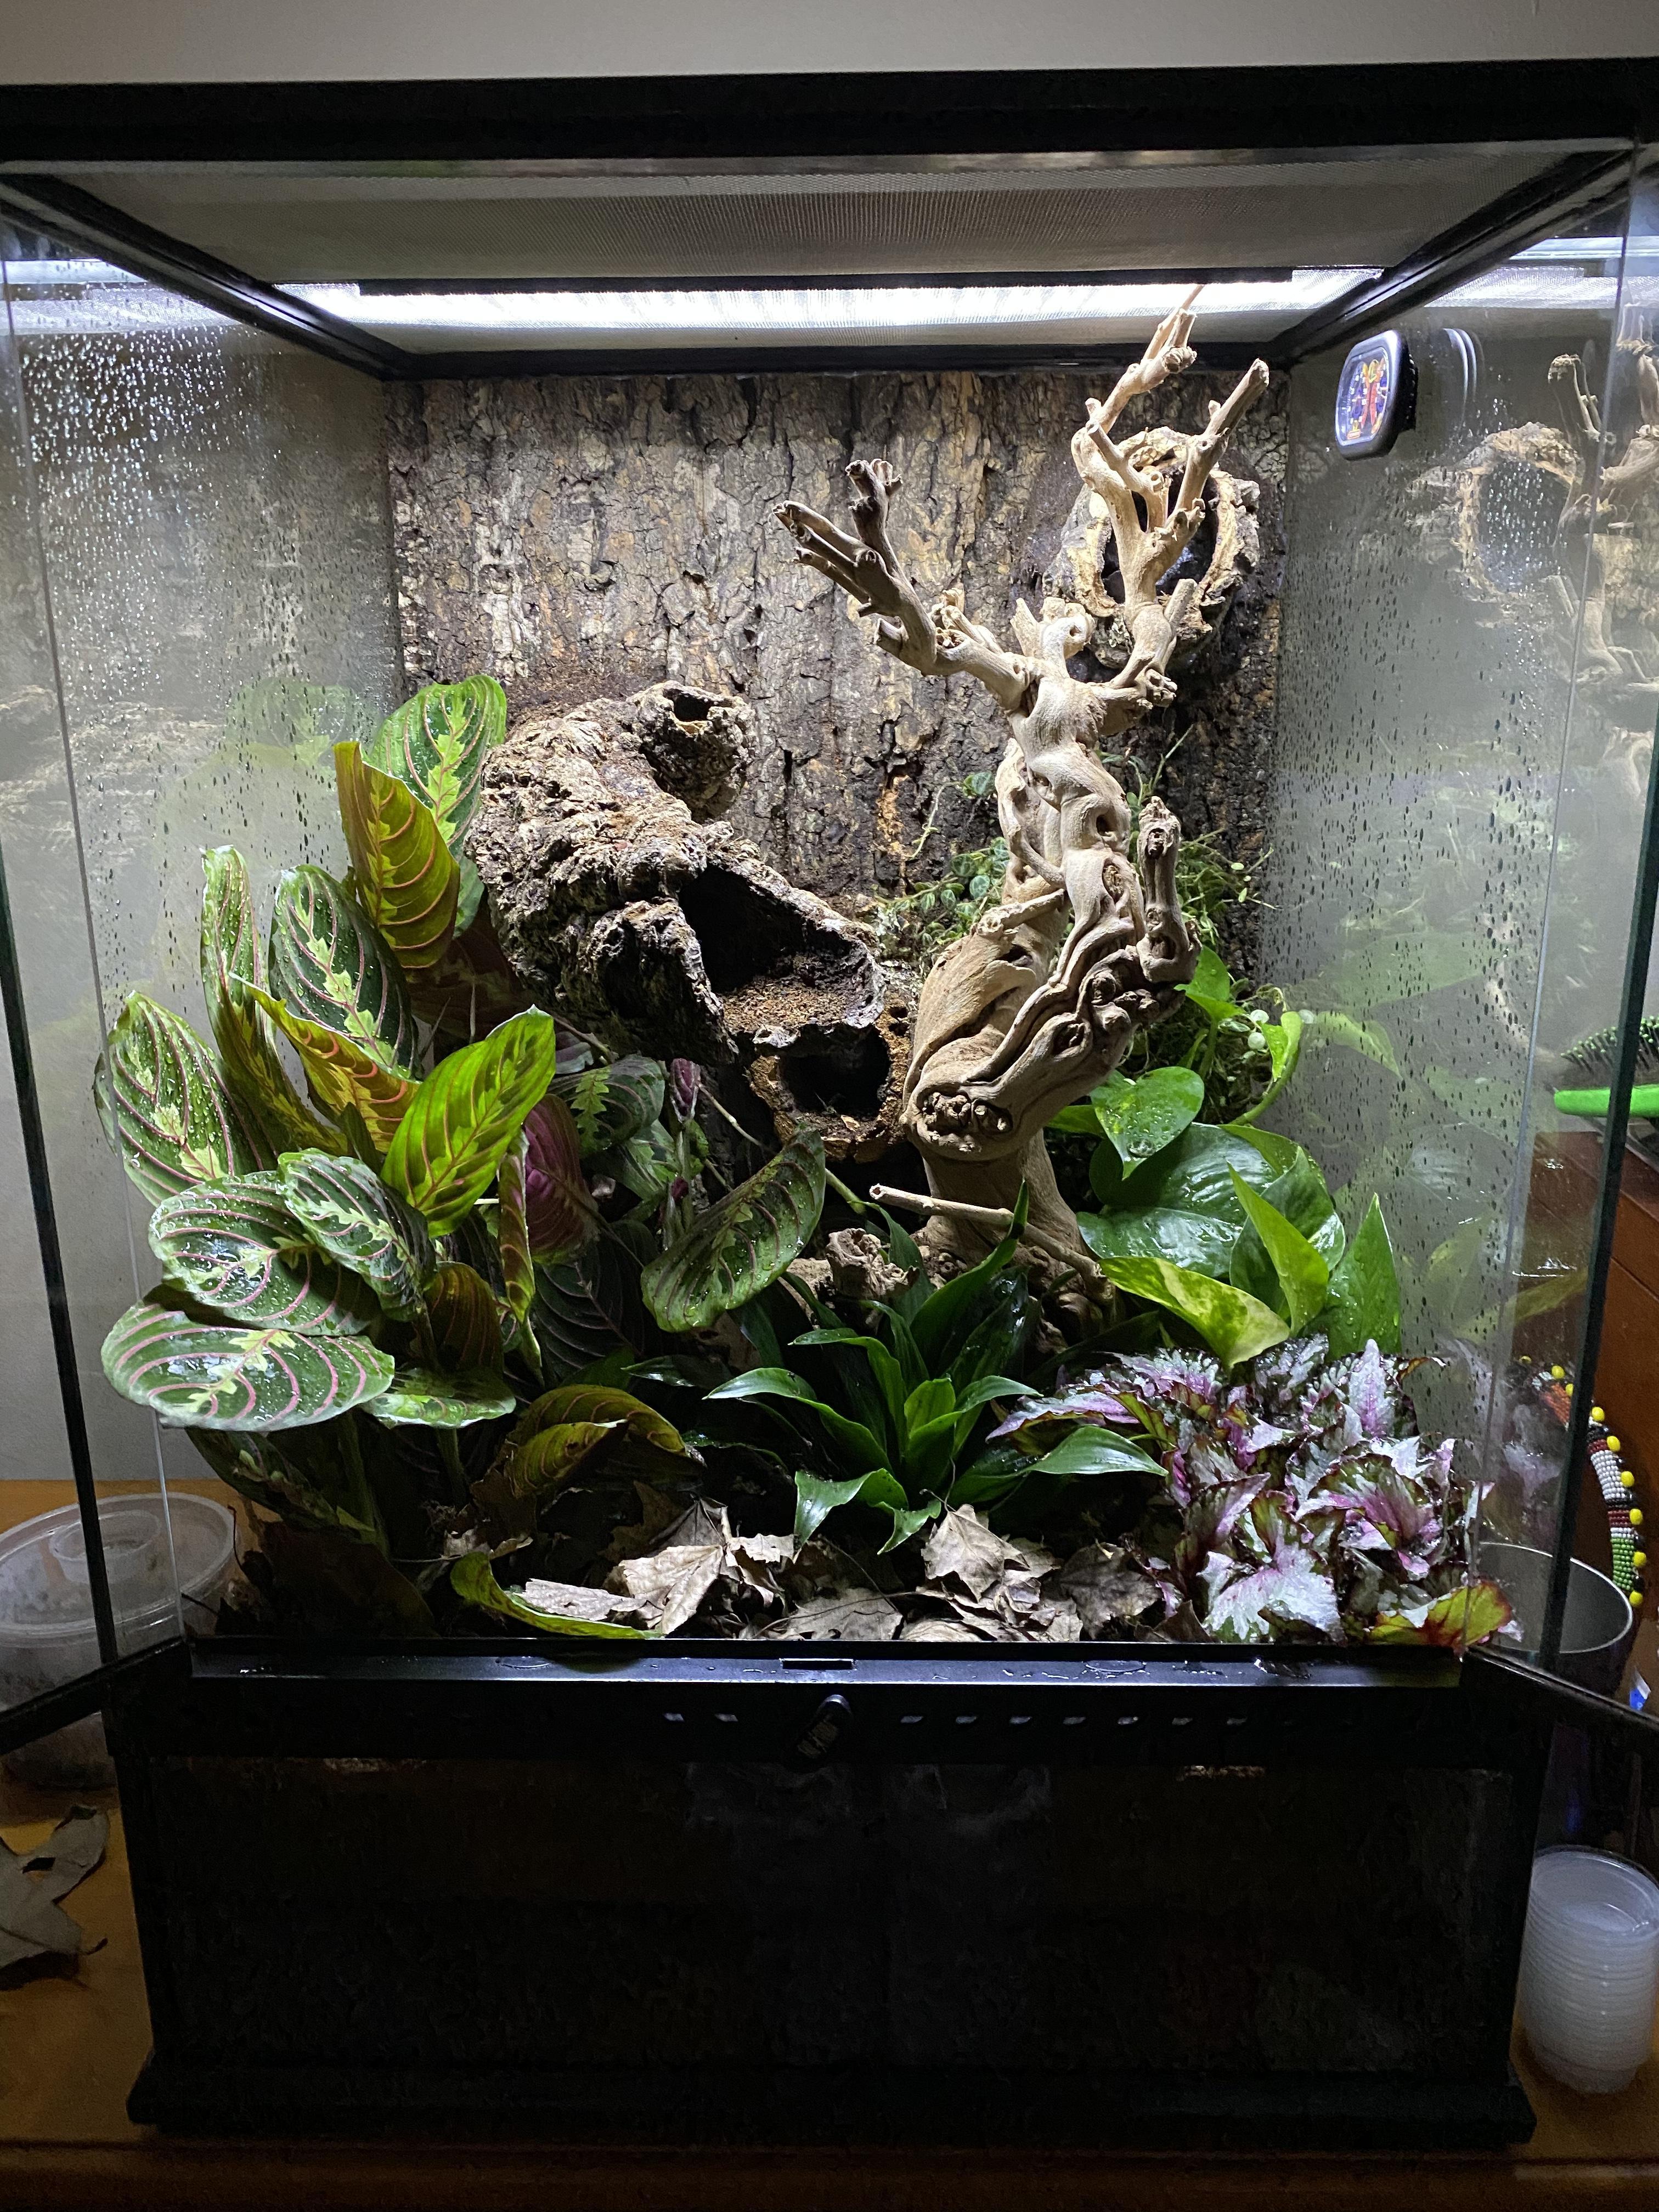 Gargoyle gecko humidity-c5637810-3cc4-4e12-b4a3-c8a68700cc09_1581880846693.jpeg